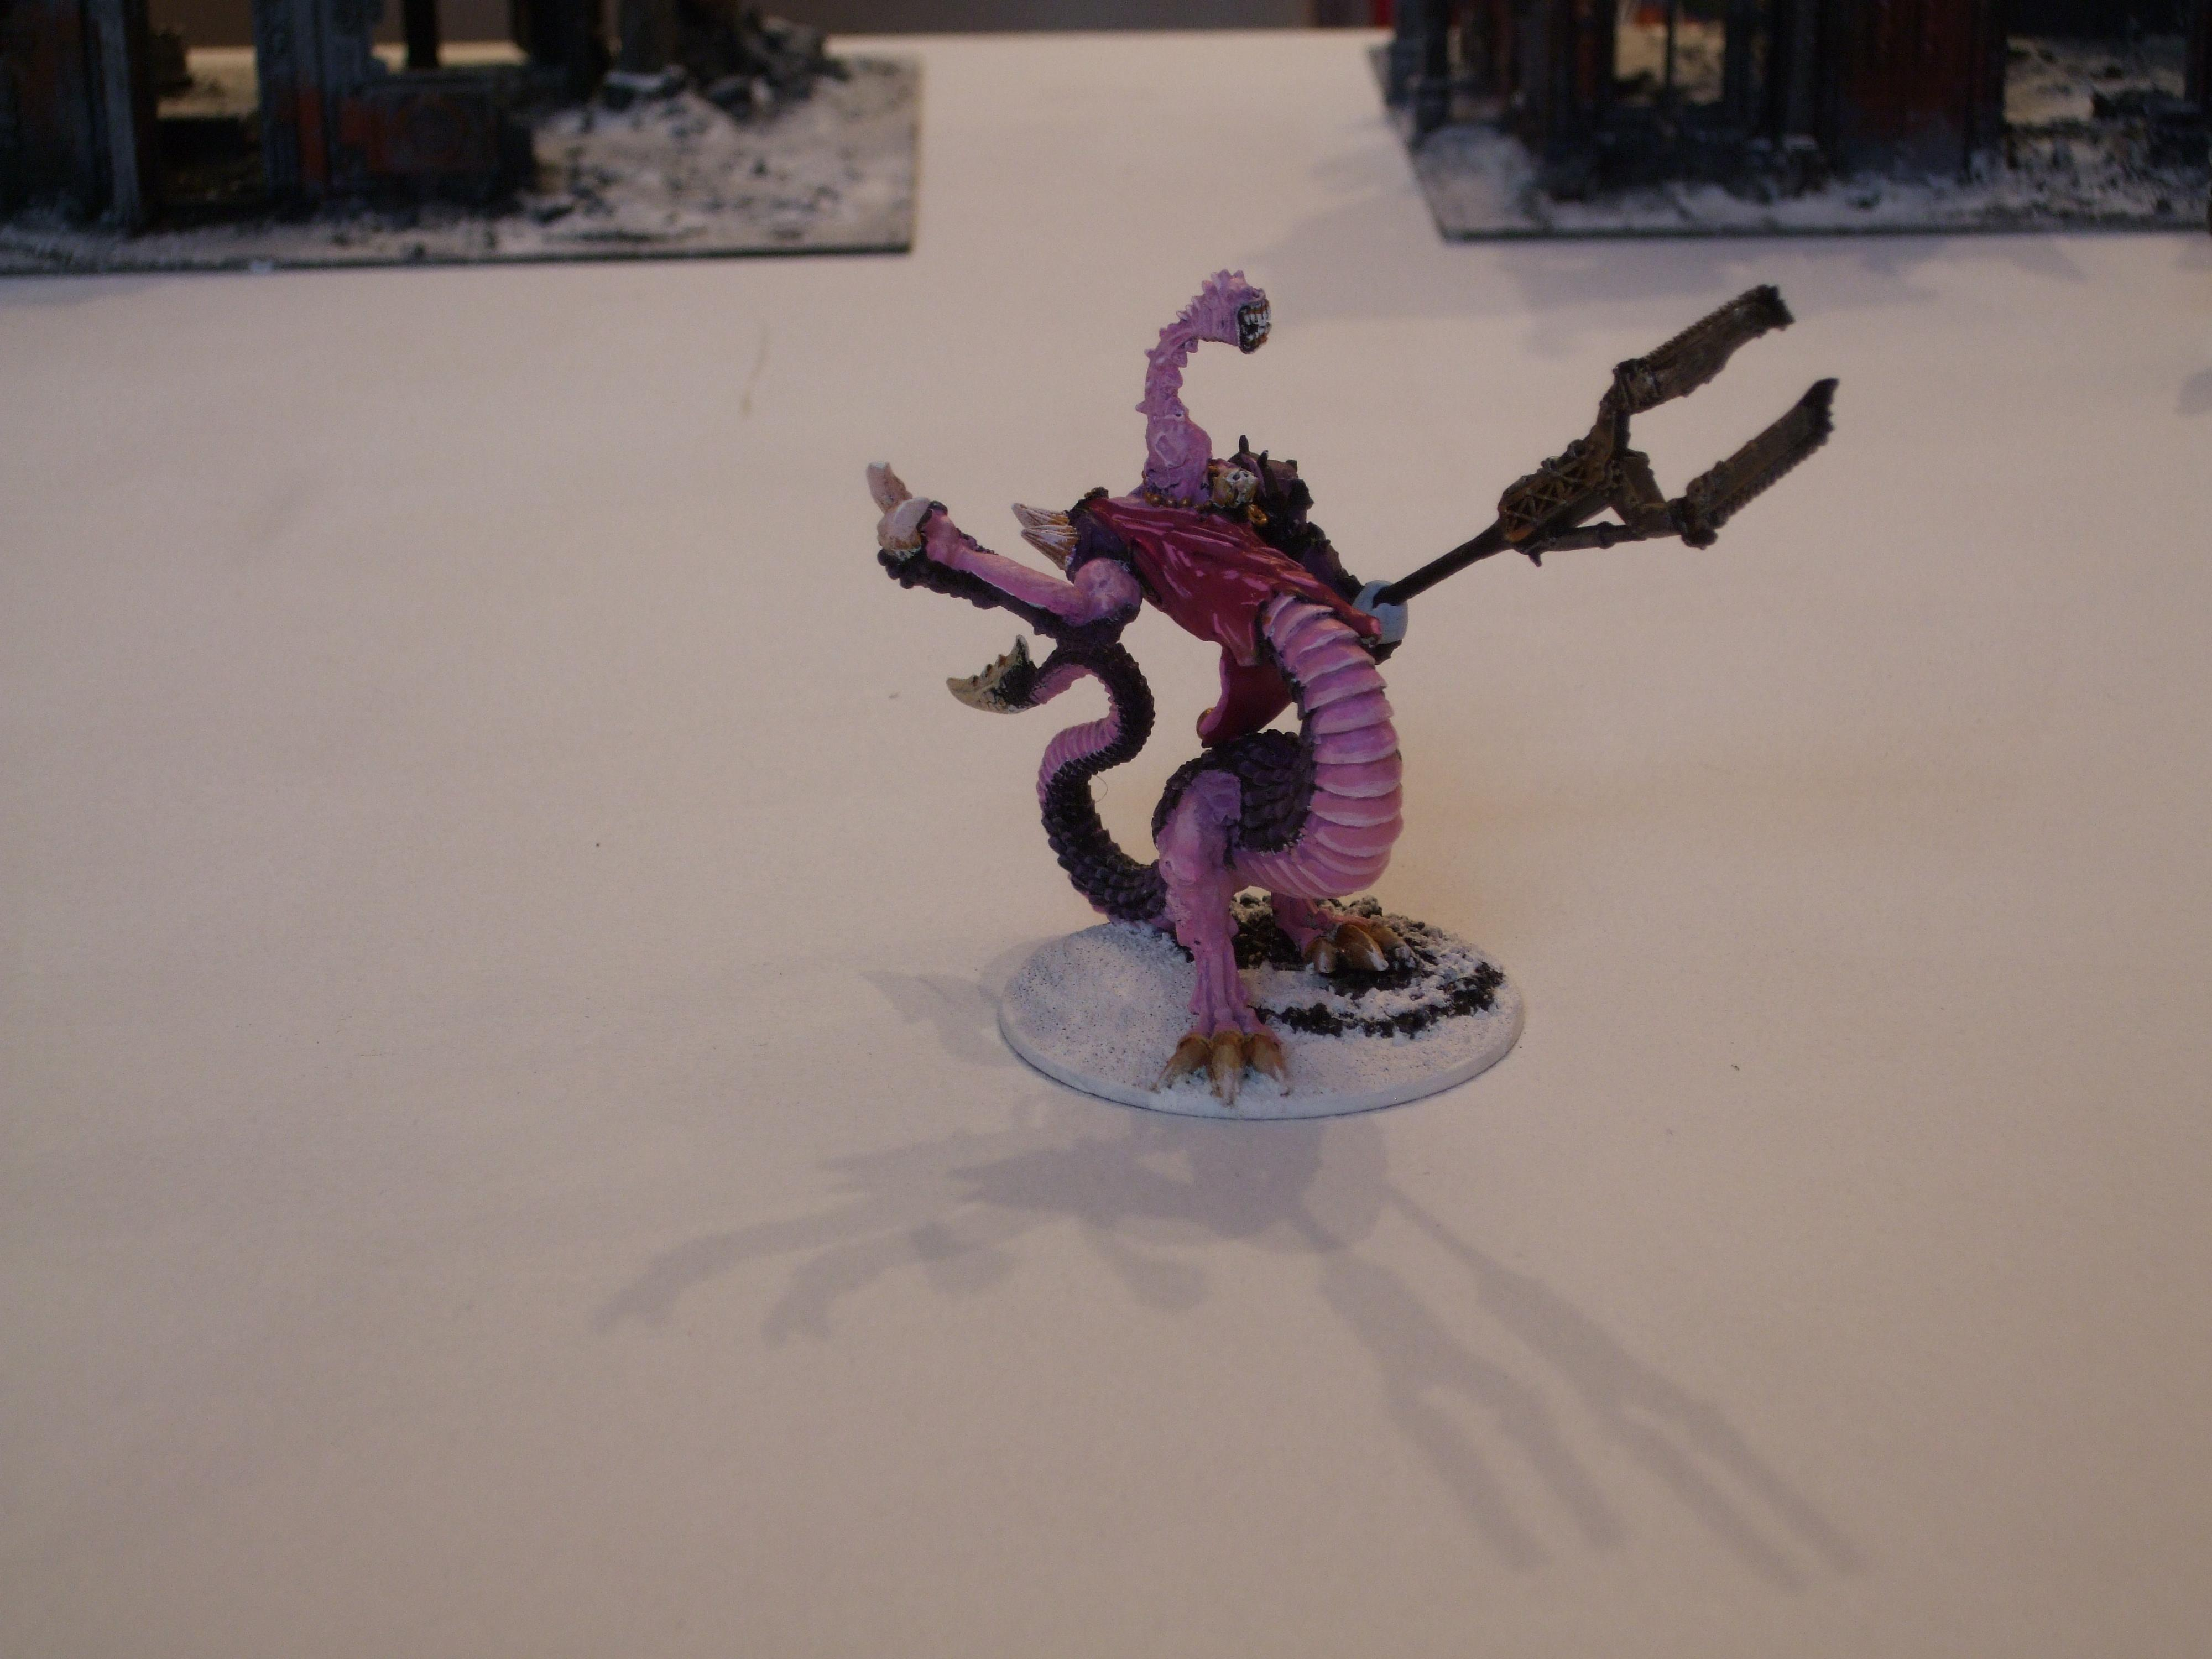 Chaos Space Marines, Emperor's Children, Pink, Purple, Slaanesh, Snow